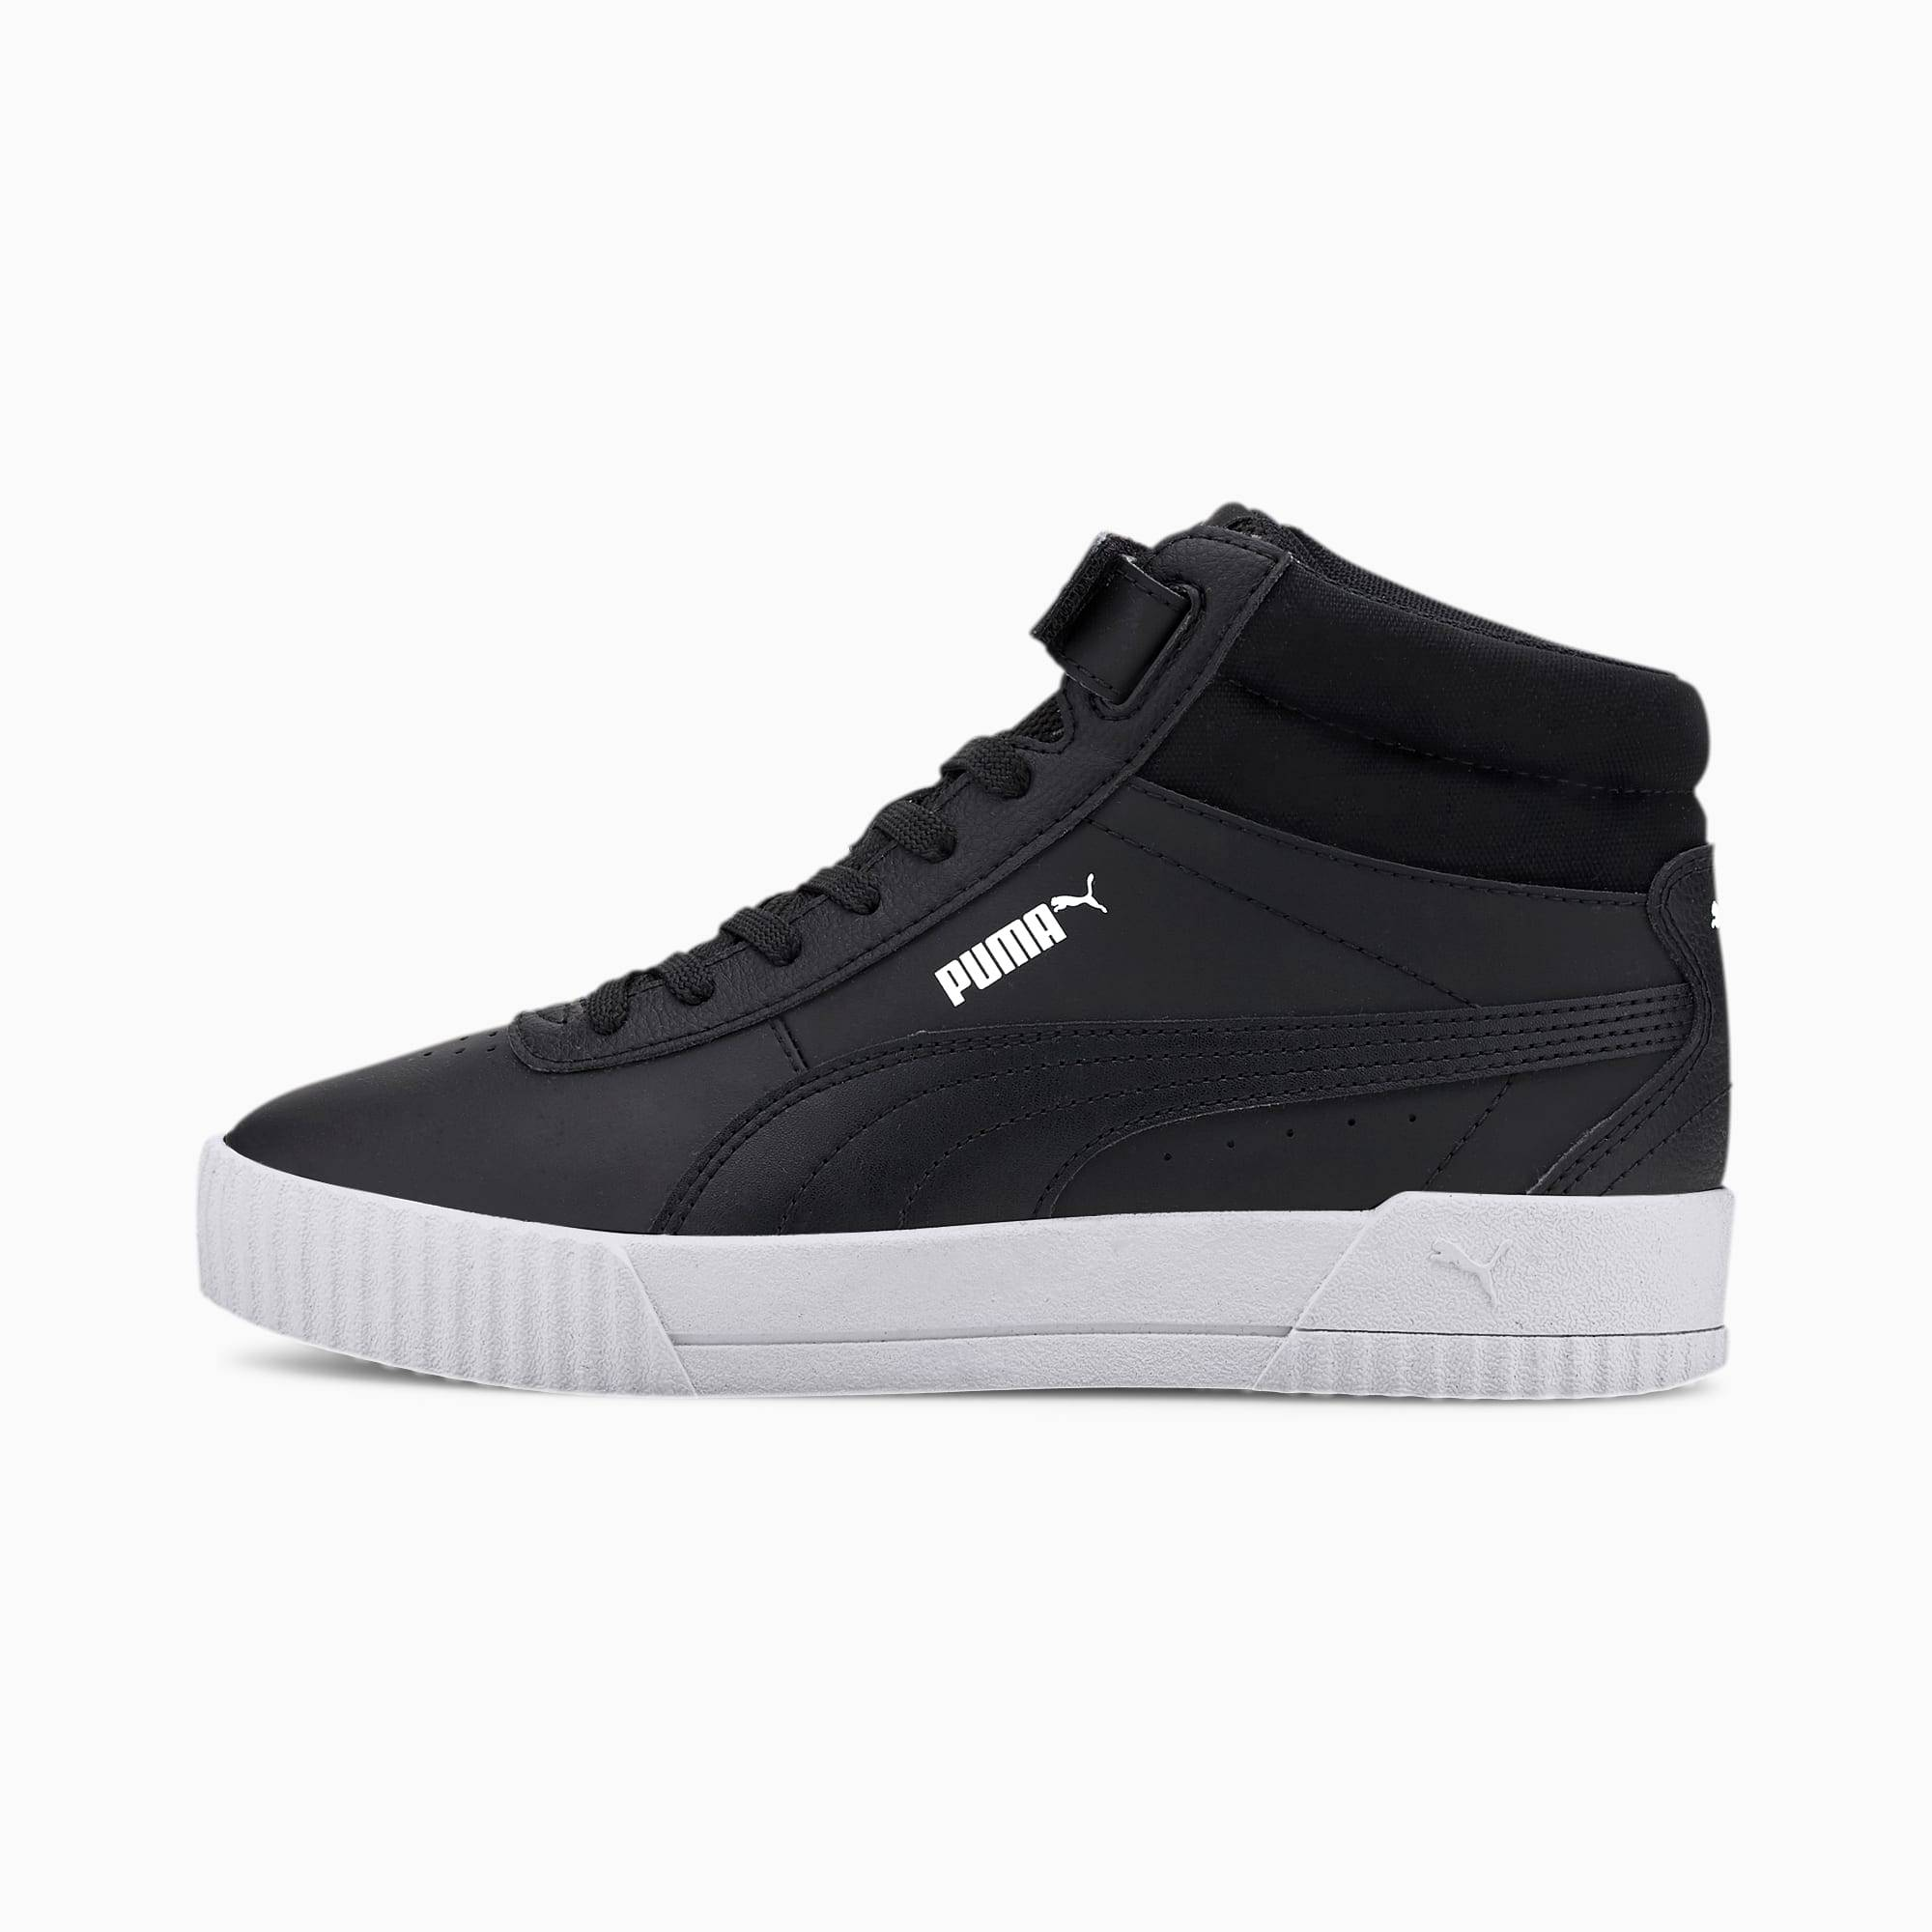 PUMA Chaussure Basket montante Carina femme, Noir, Taille 39, Chaussures